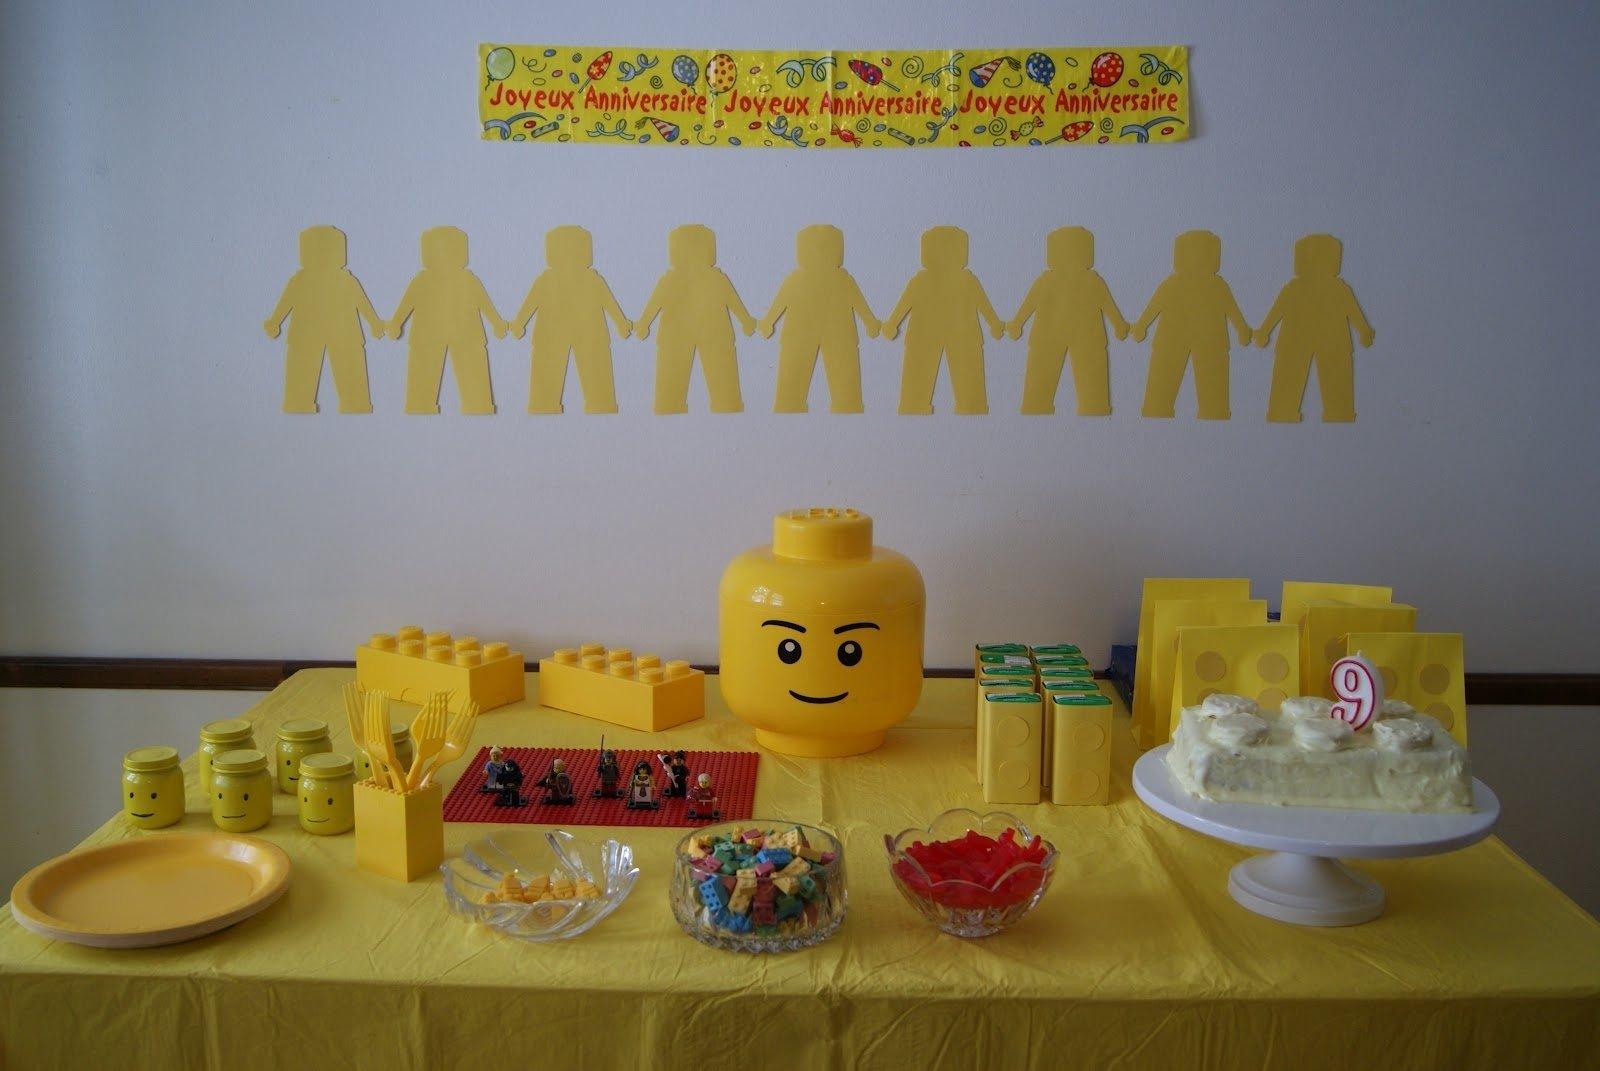 nest full of eggs: yellow lego birthday